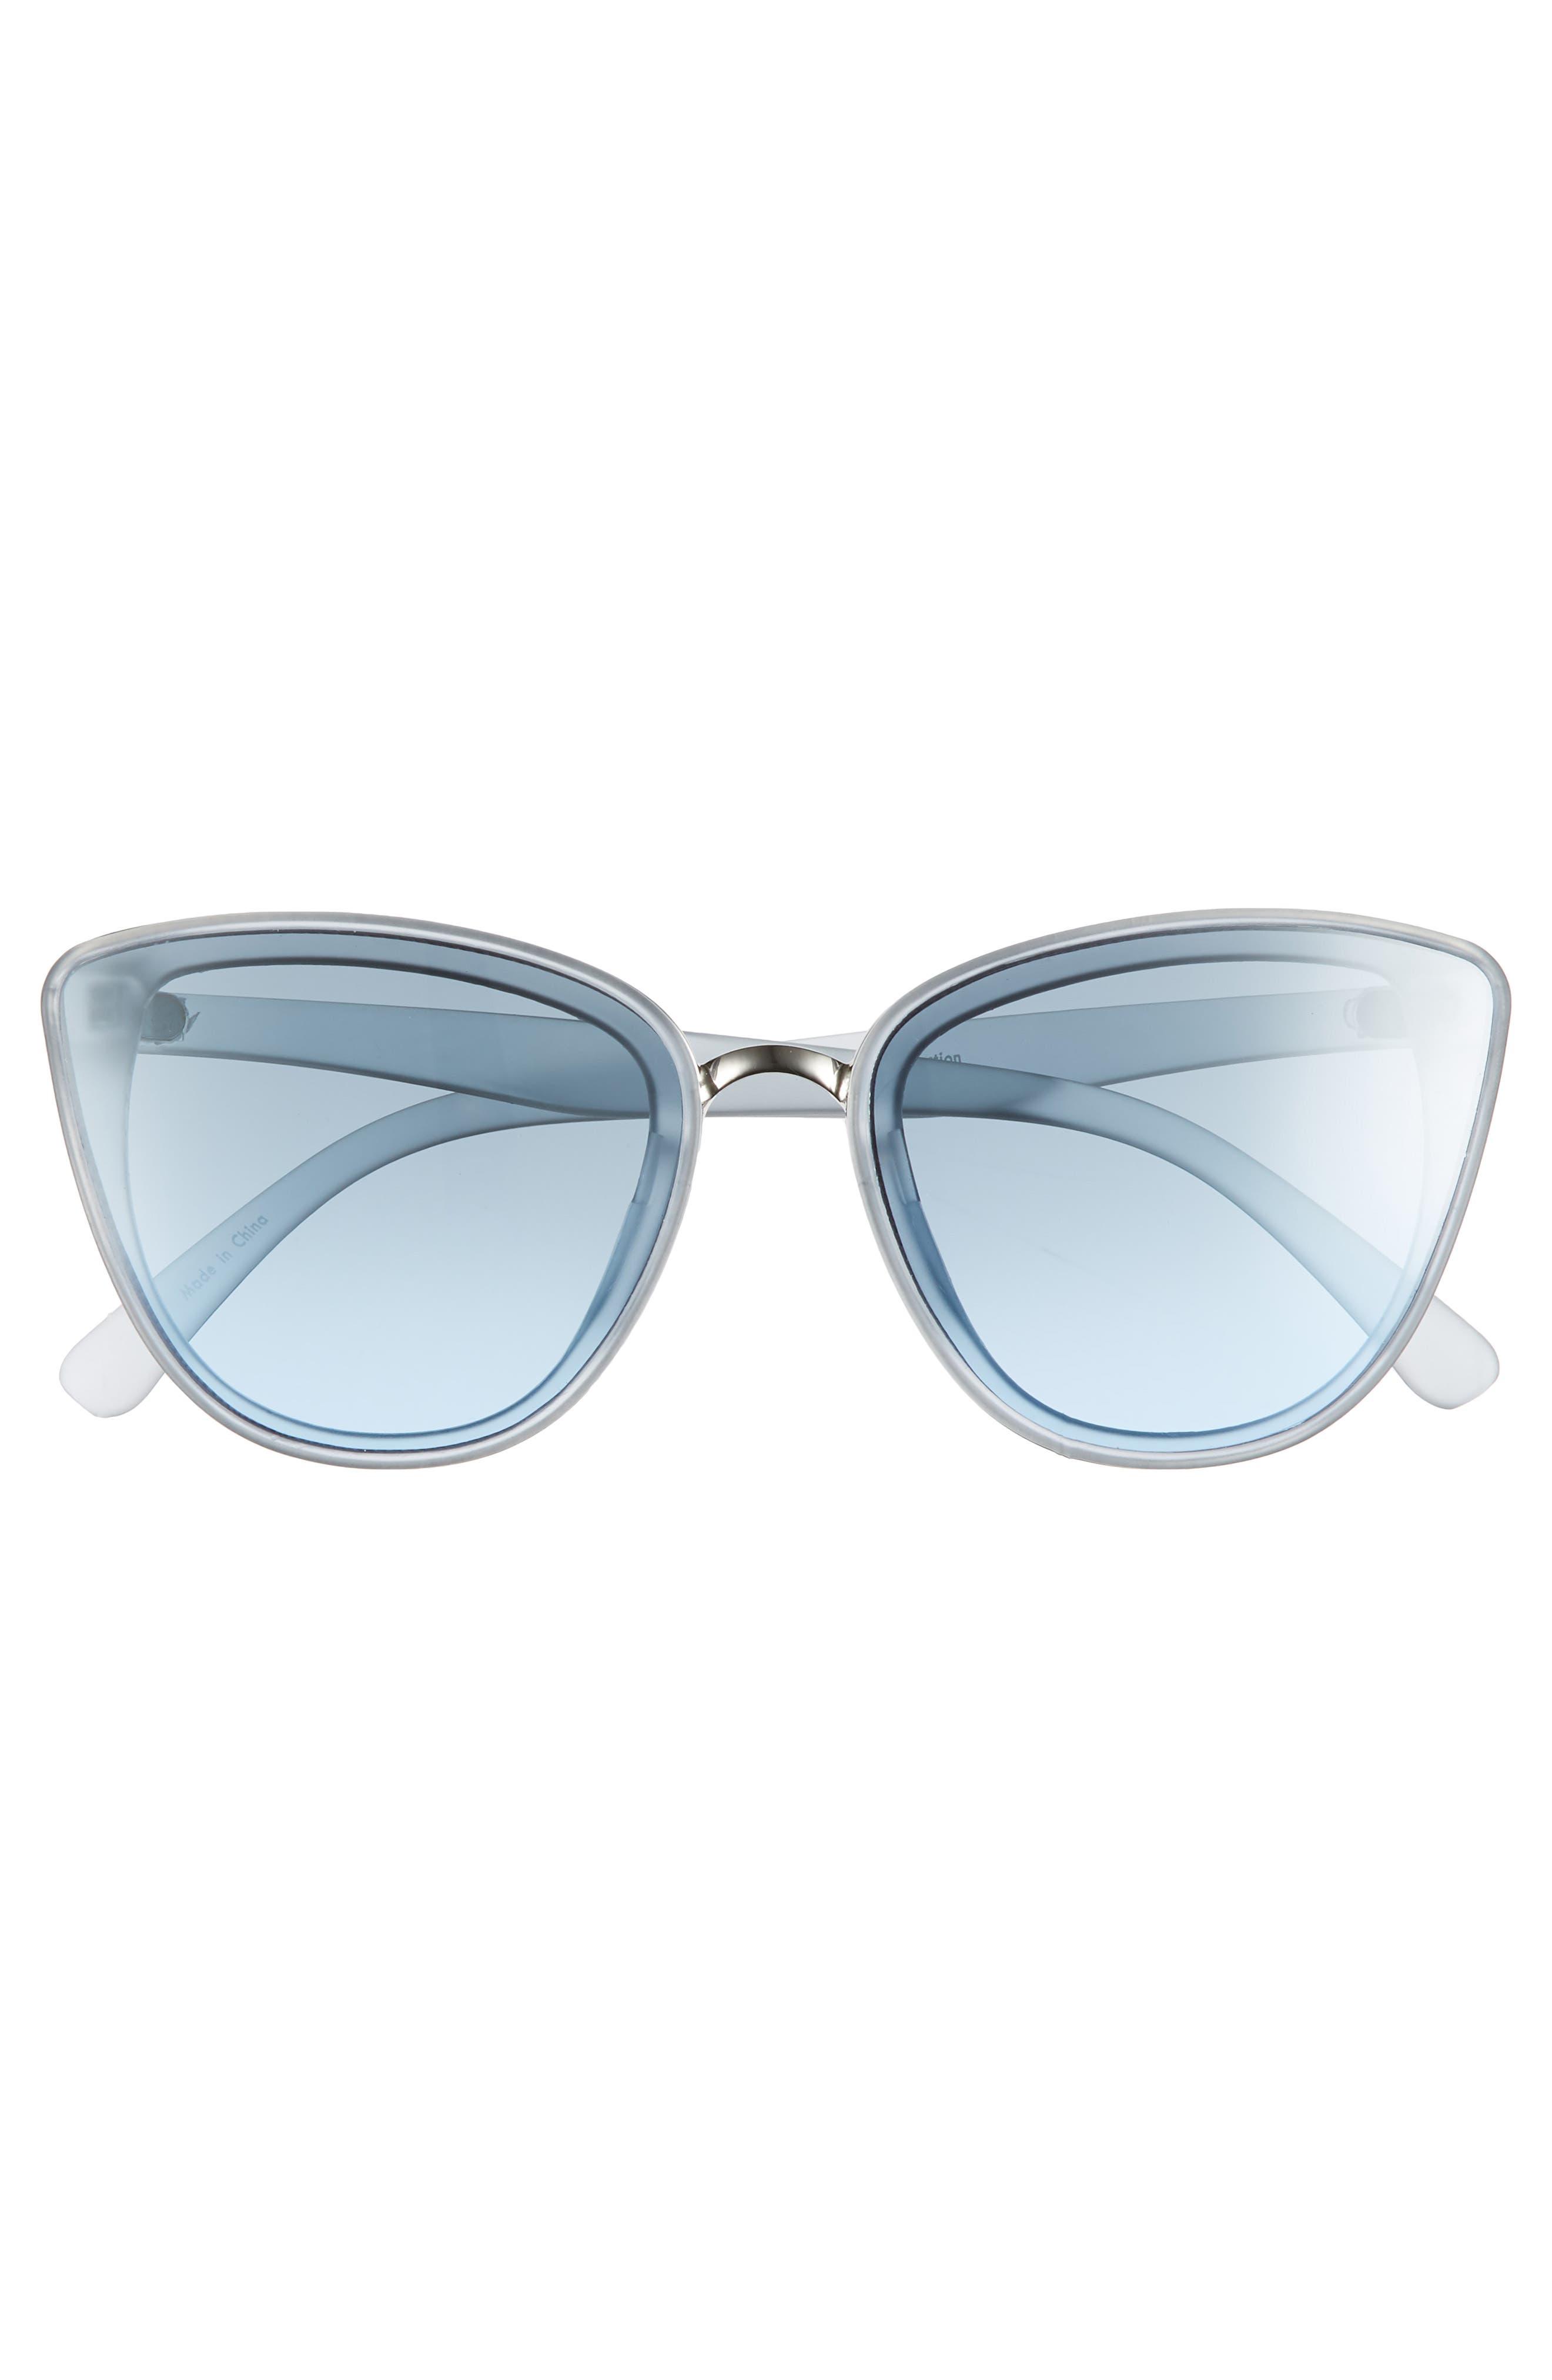 59mm Perfect Cat Eye Sunglasses,                             Alternate thumbnail 3, color,                             Blue/ Blue